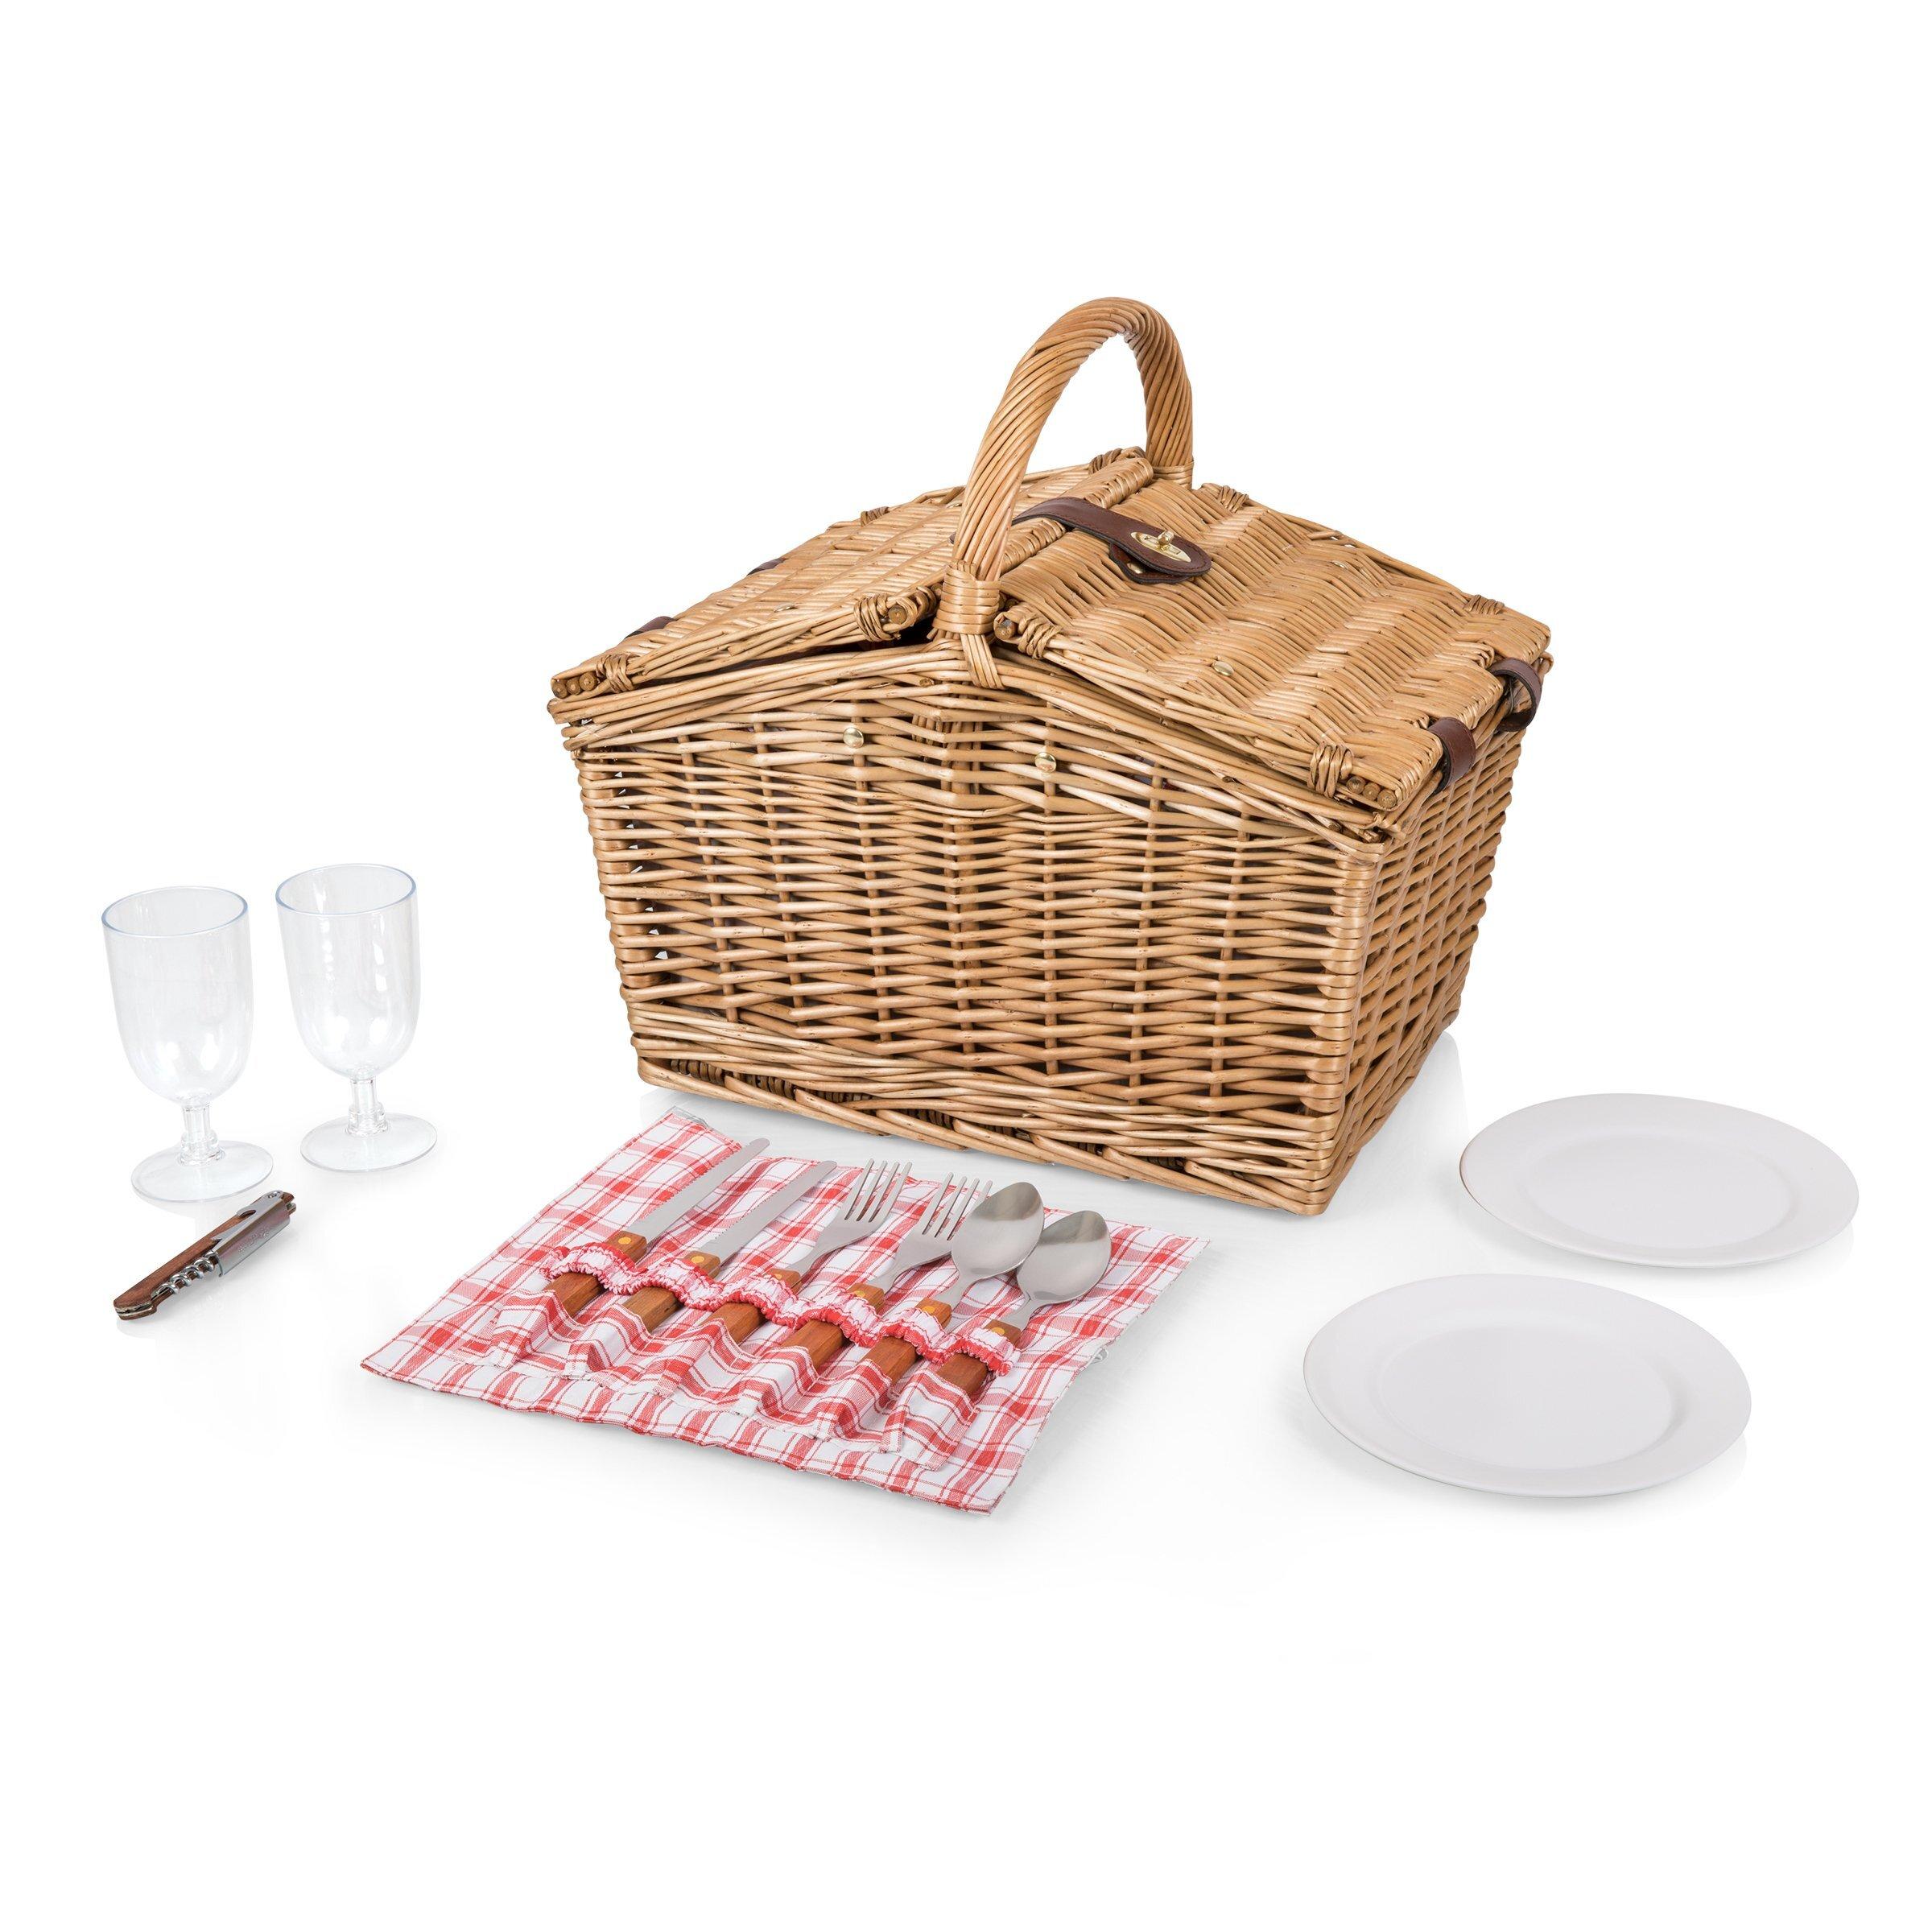 Piccadilly Picnic Basket Set